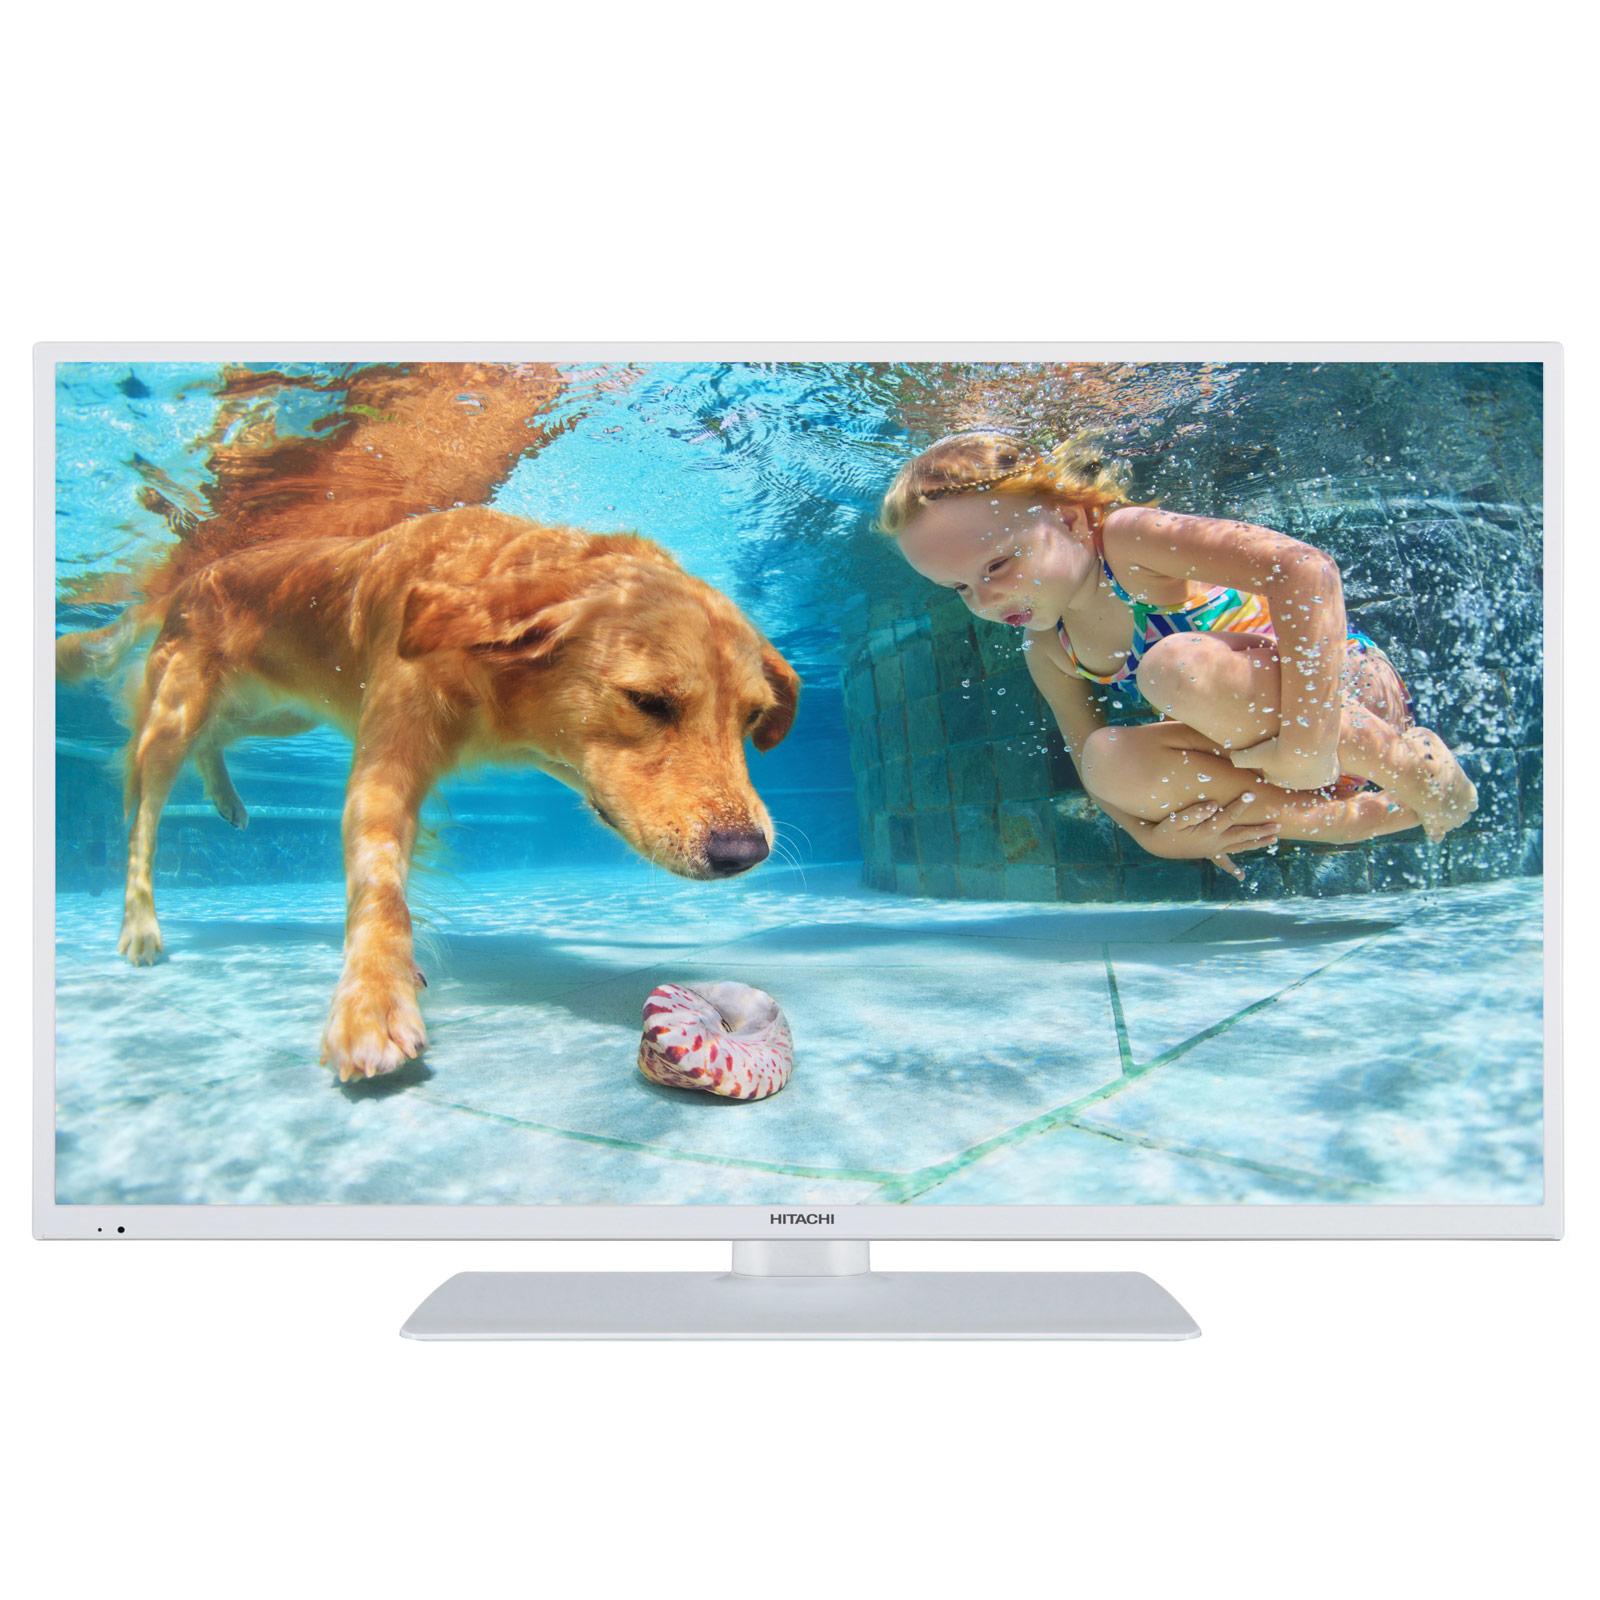 "TV Hitachi 43HK6000 Blanc Téléviseur LED 4K 43"" (109 cm) 16/9 - 3840 x 2160 pixels - HDR - Ultra HD - Wi-Fi - Bluetooth - 1200 Hz"